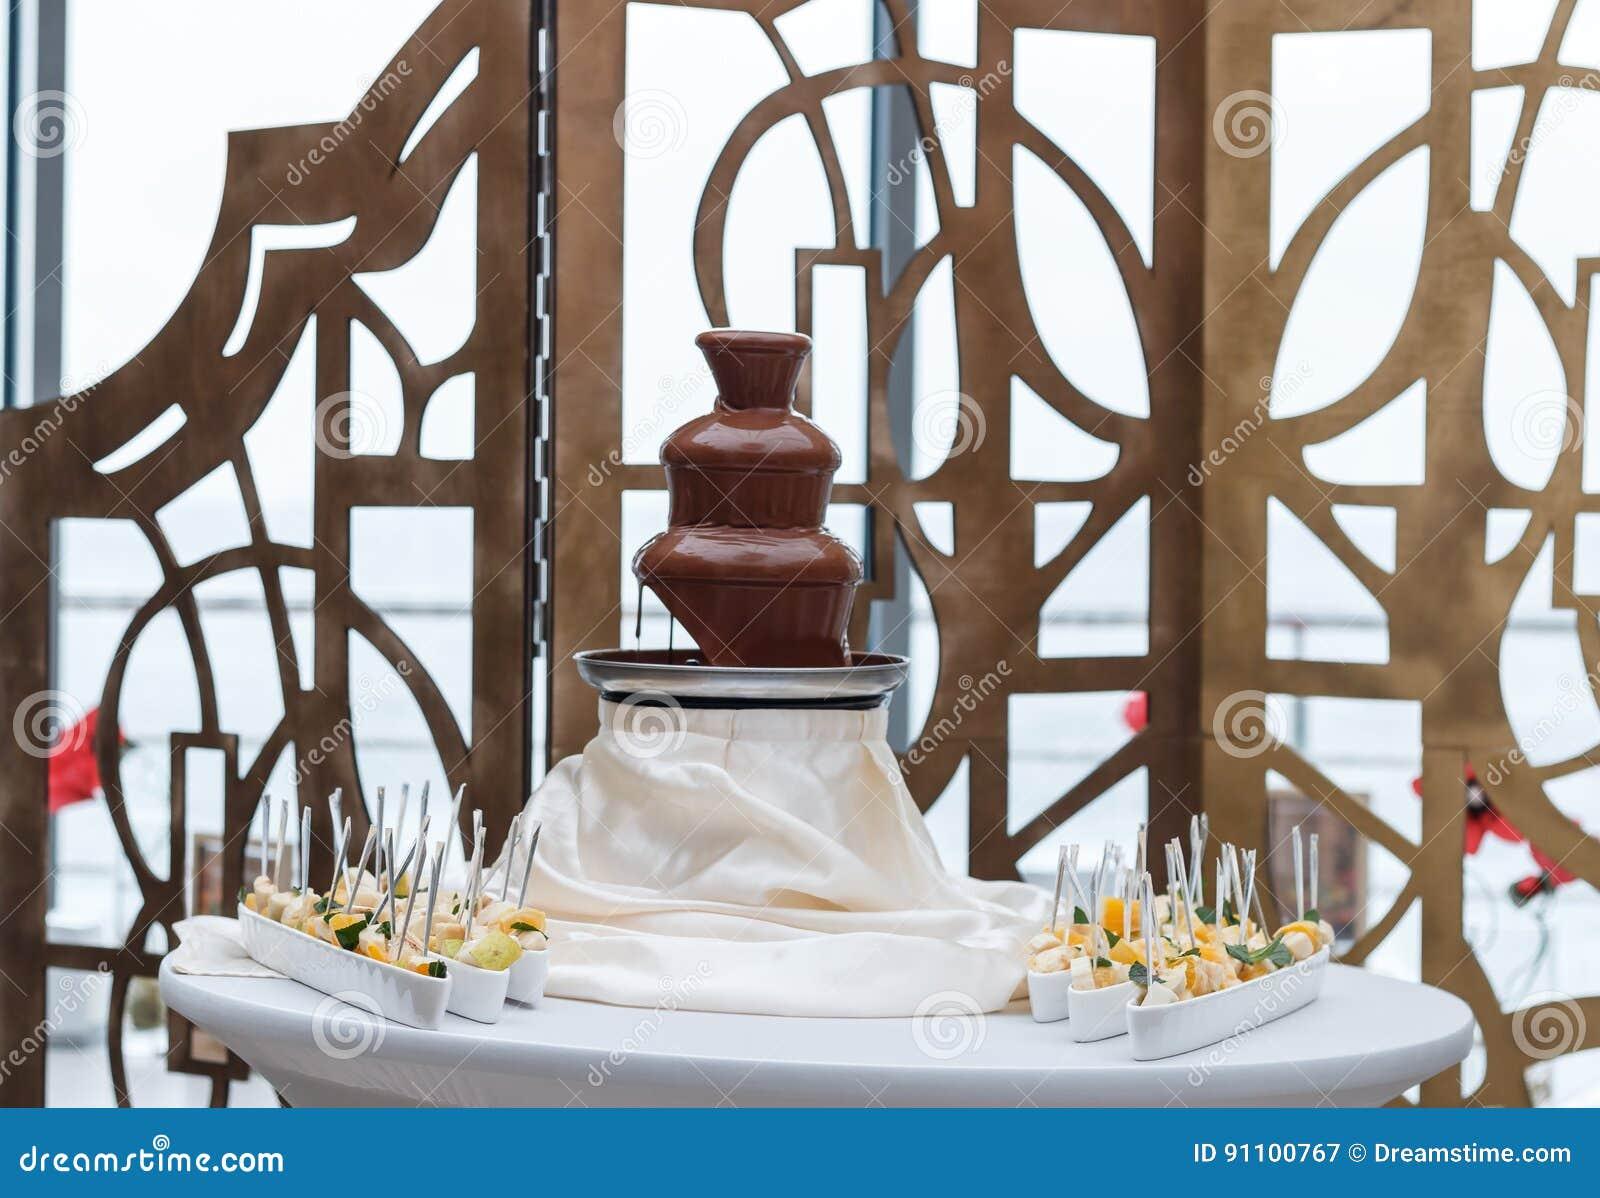 Amazing Chocolate Fountain Stock Image Image Of Decoration 91100767